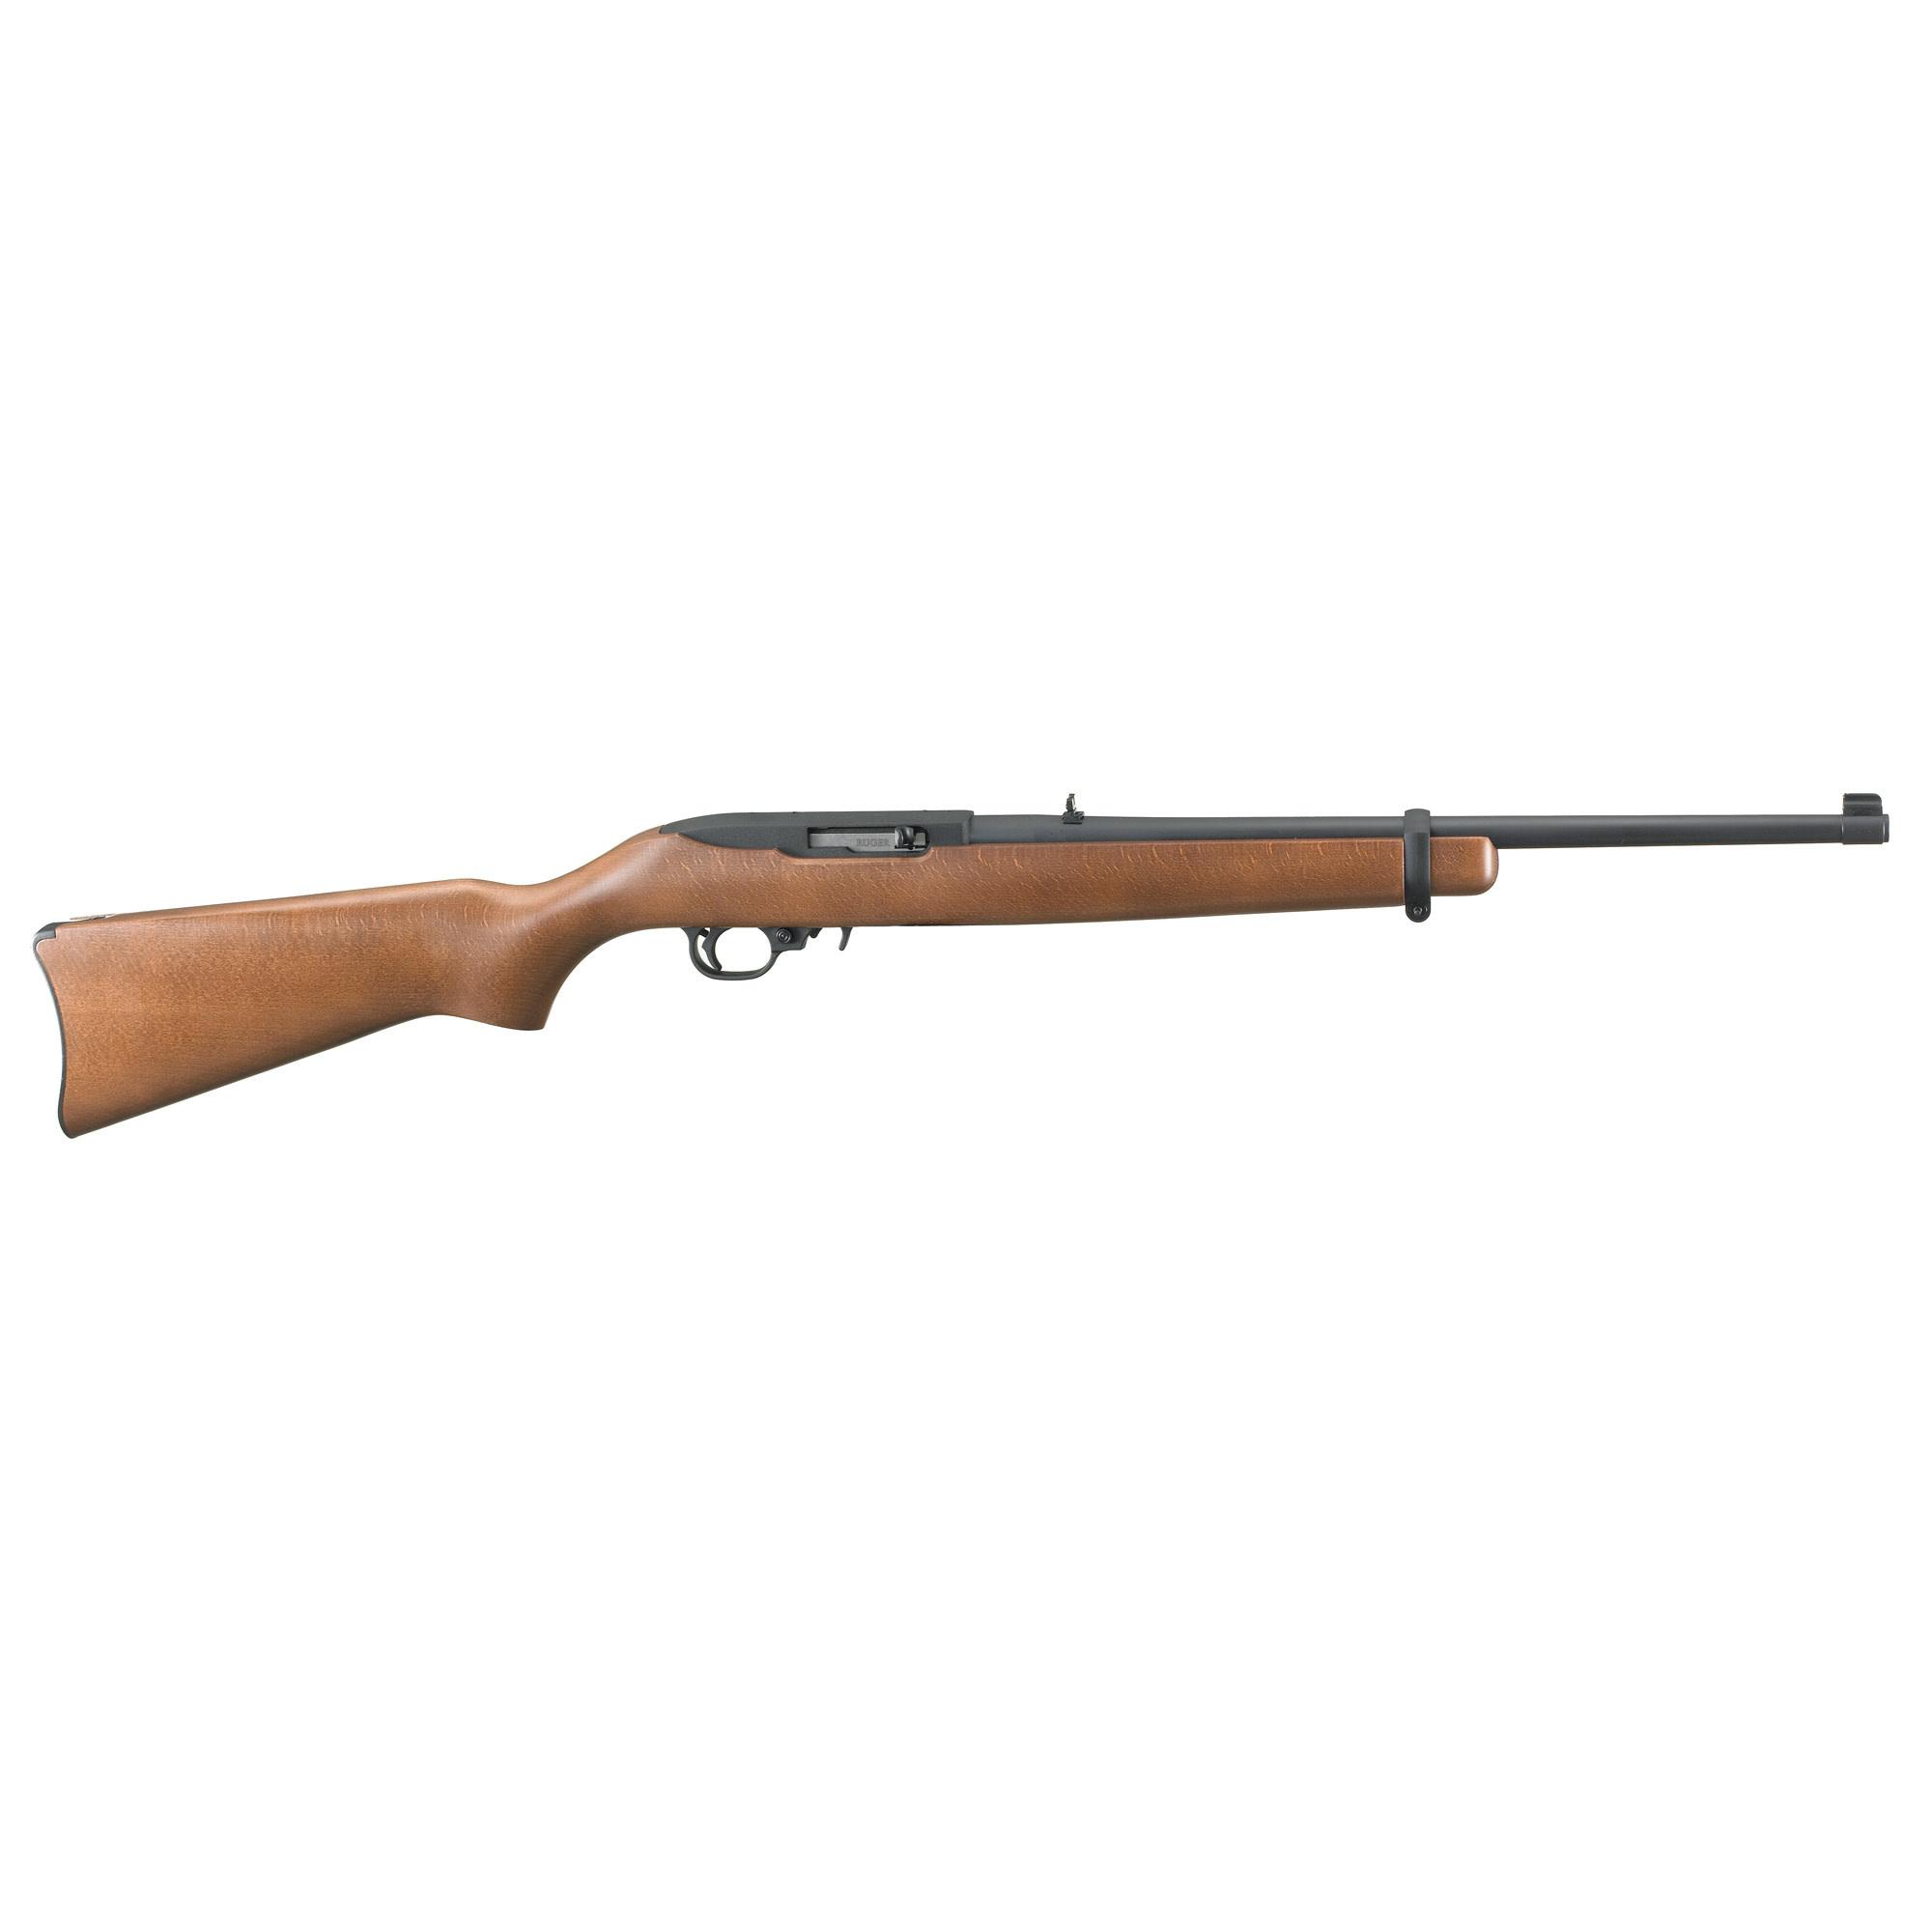 "Ruger, 10/22 Carbine, 22 LR, 18.5"", Black Steel, Hardwood Stock, Adjustable Rear and Gold Bead Front Sight, 10Rd"